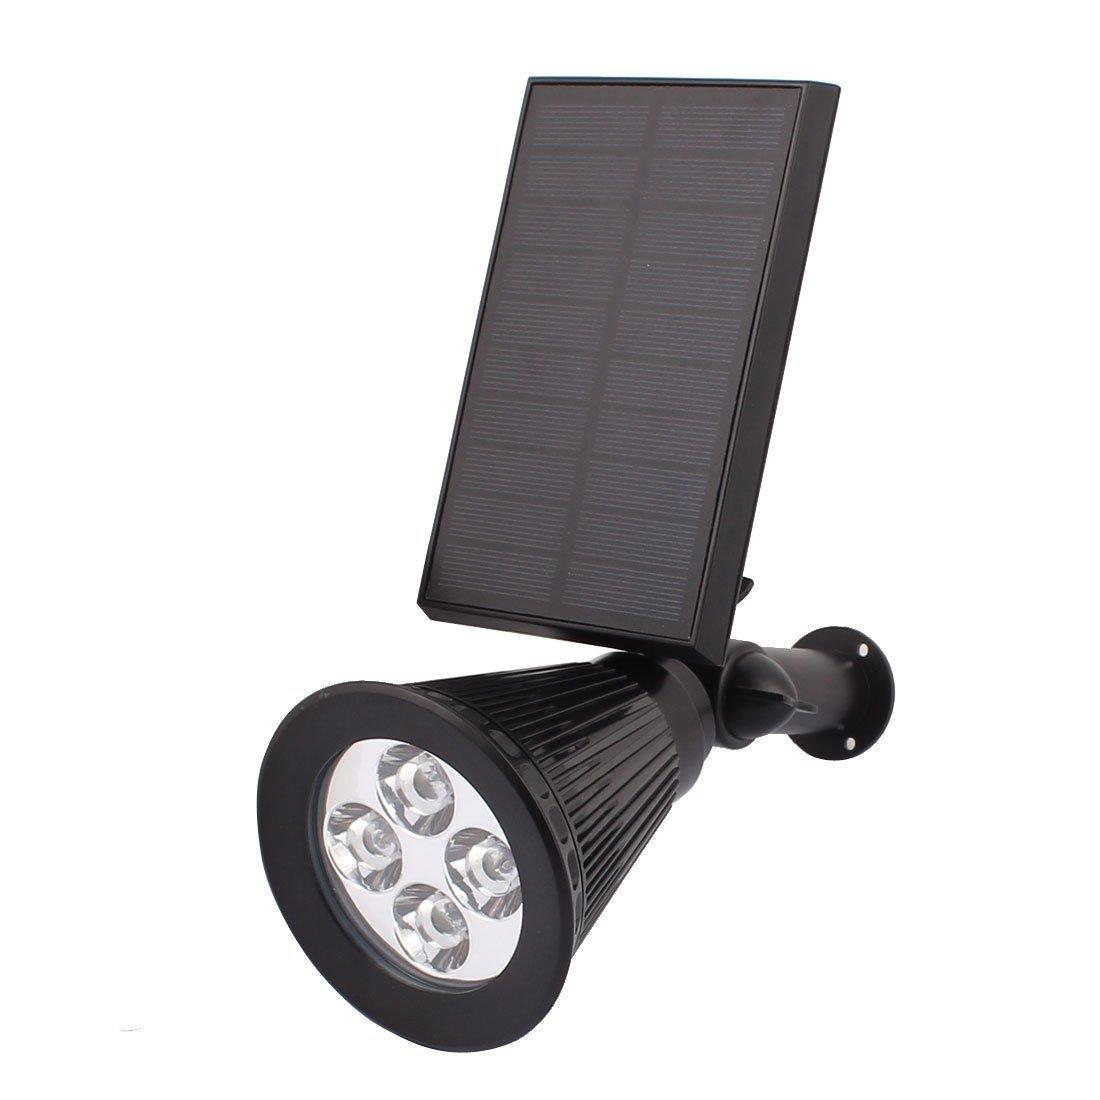 Paisaje eDealMax del Punto de luz Solar al aire Libre migas DE 4 LED jardín al aire Libre del Sensor de la lámpara: Amazon.com: Industrial & Scientific